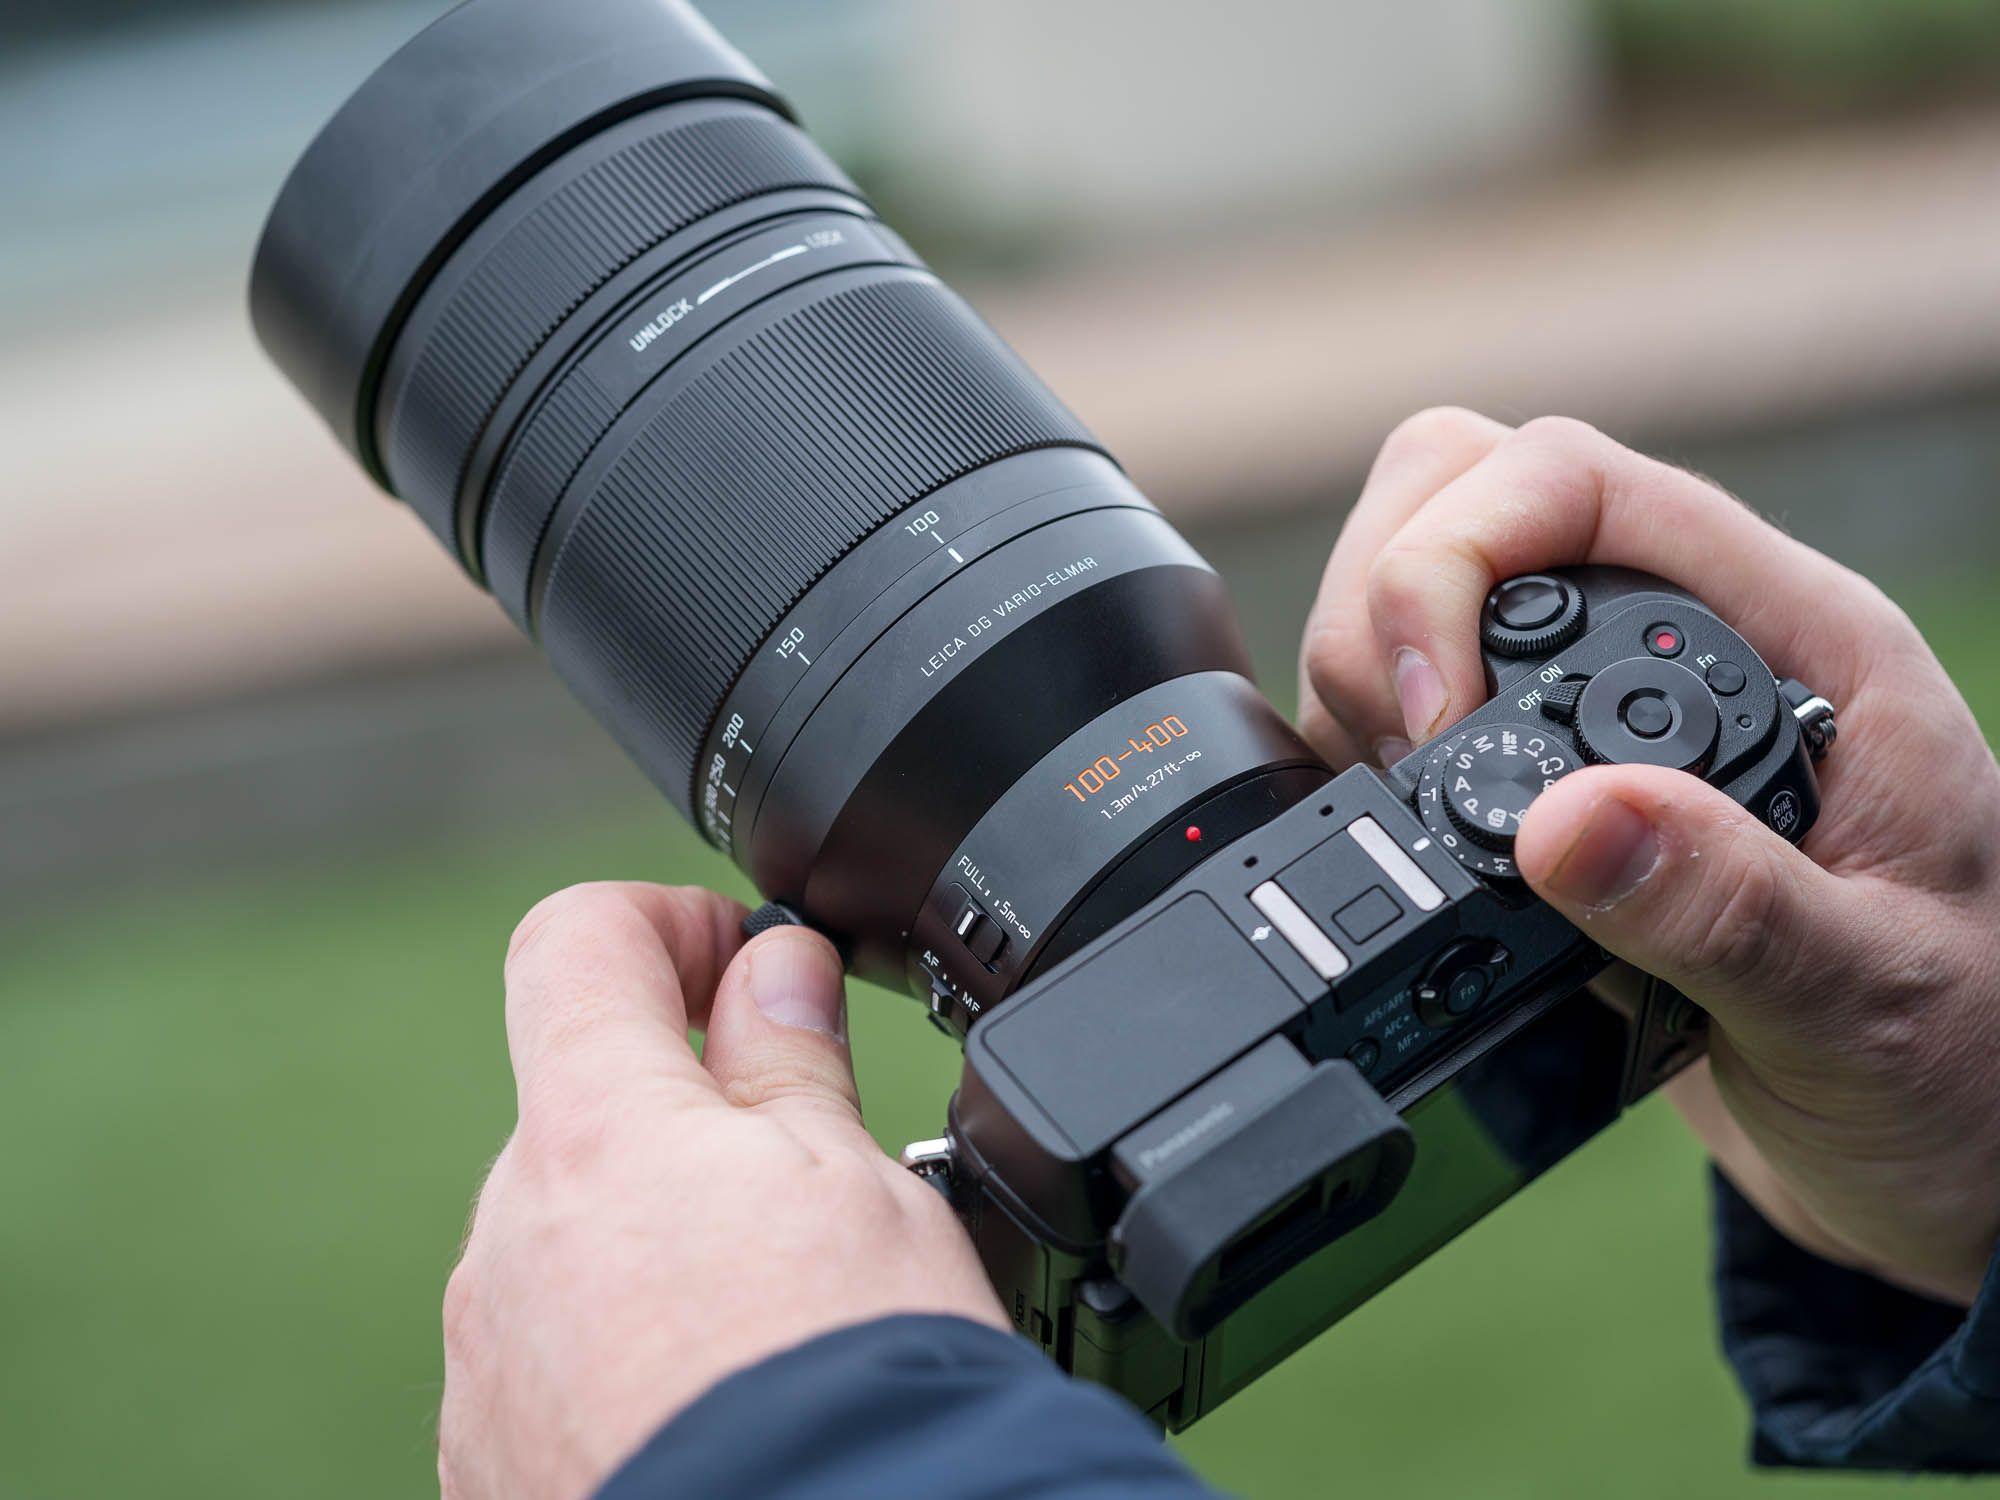 Panasonic Leica Dg 100 400mm F 4 0 6 3 Asph Image 7 Photo Equipment Leica Image